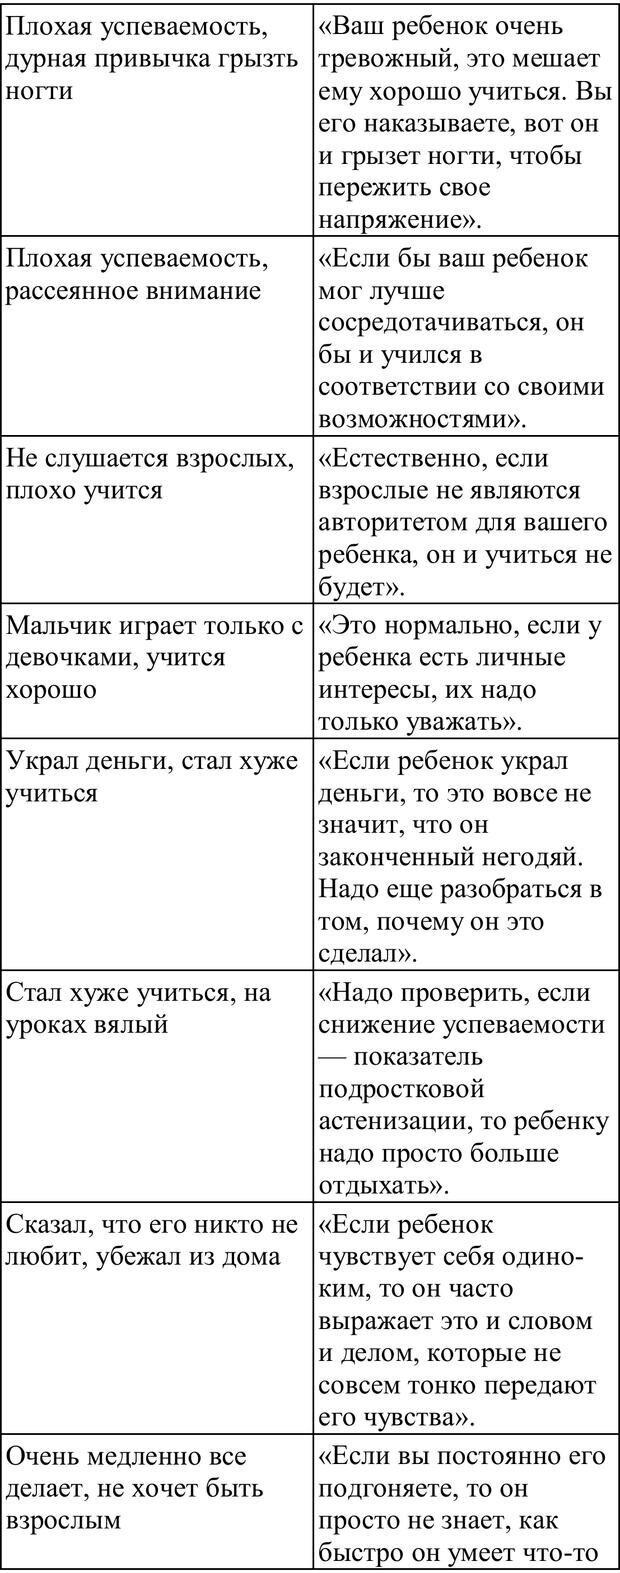 PDF. Практическая психология. Абрамова Г. С. Страница 204. Читать онлайн